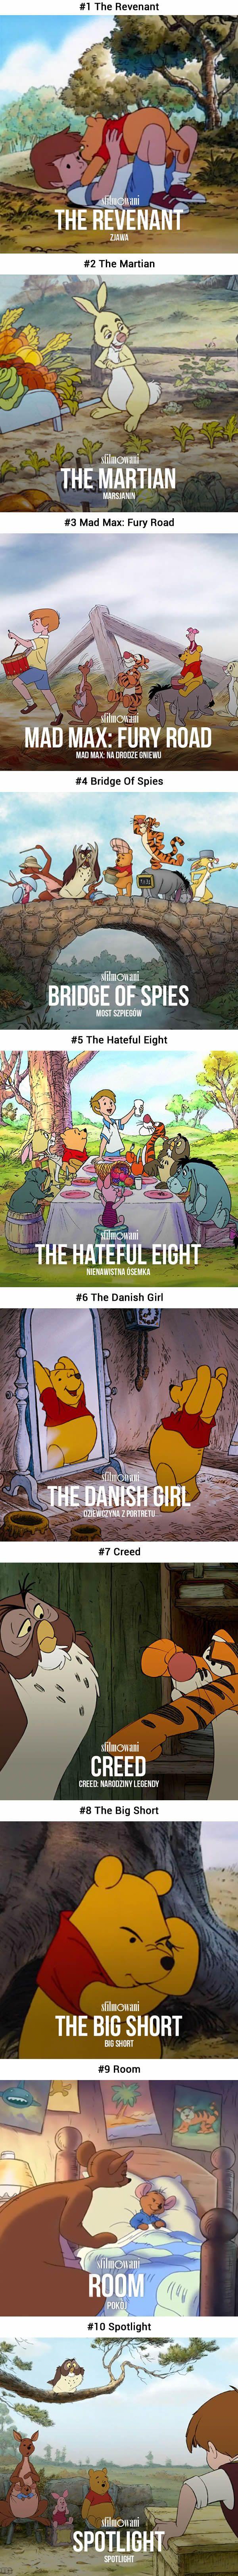 10 Oscar-Nominated Movies Recreated With Winnie The Pooh (By Dawid Adamek) - 9GAG